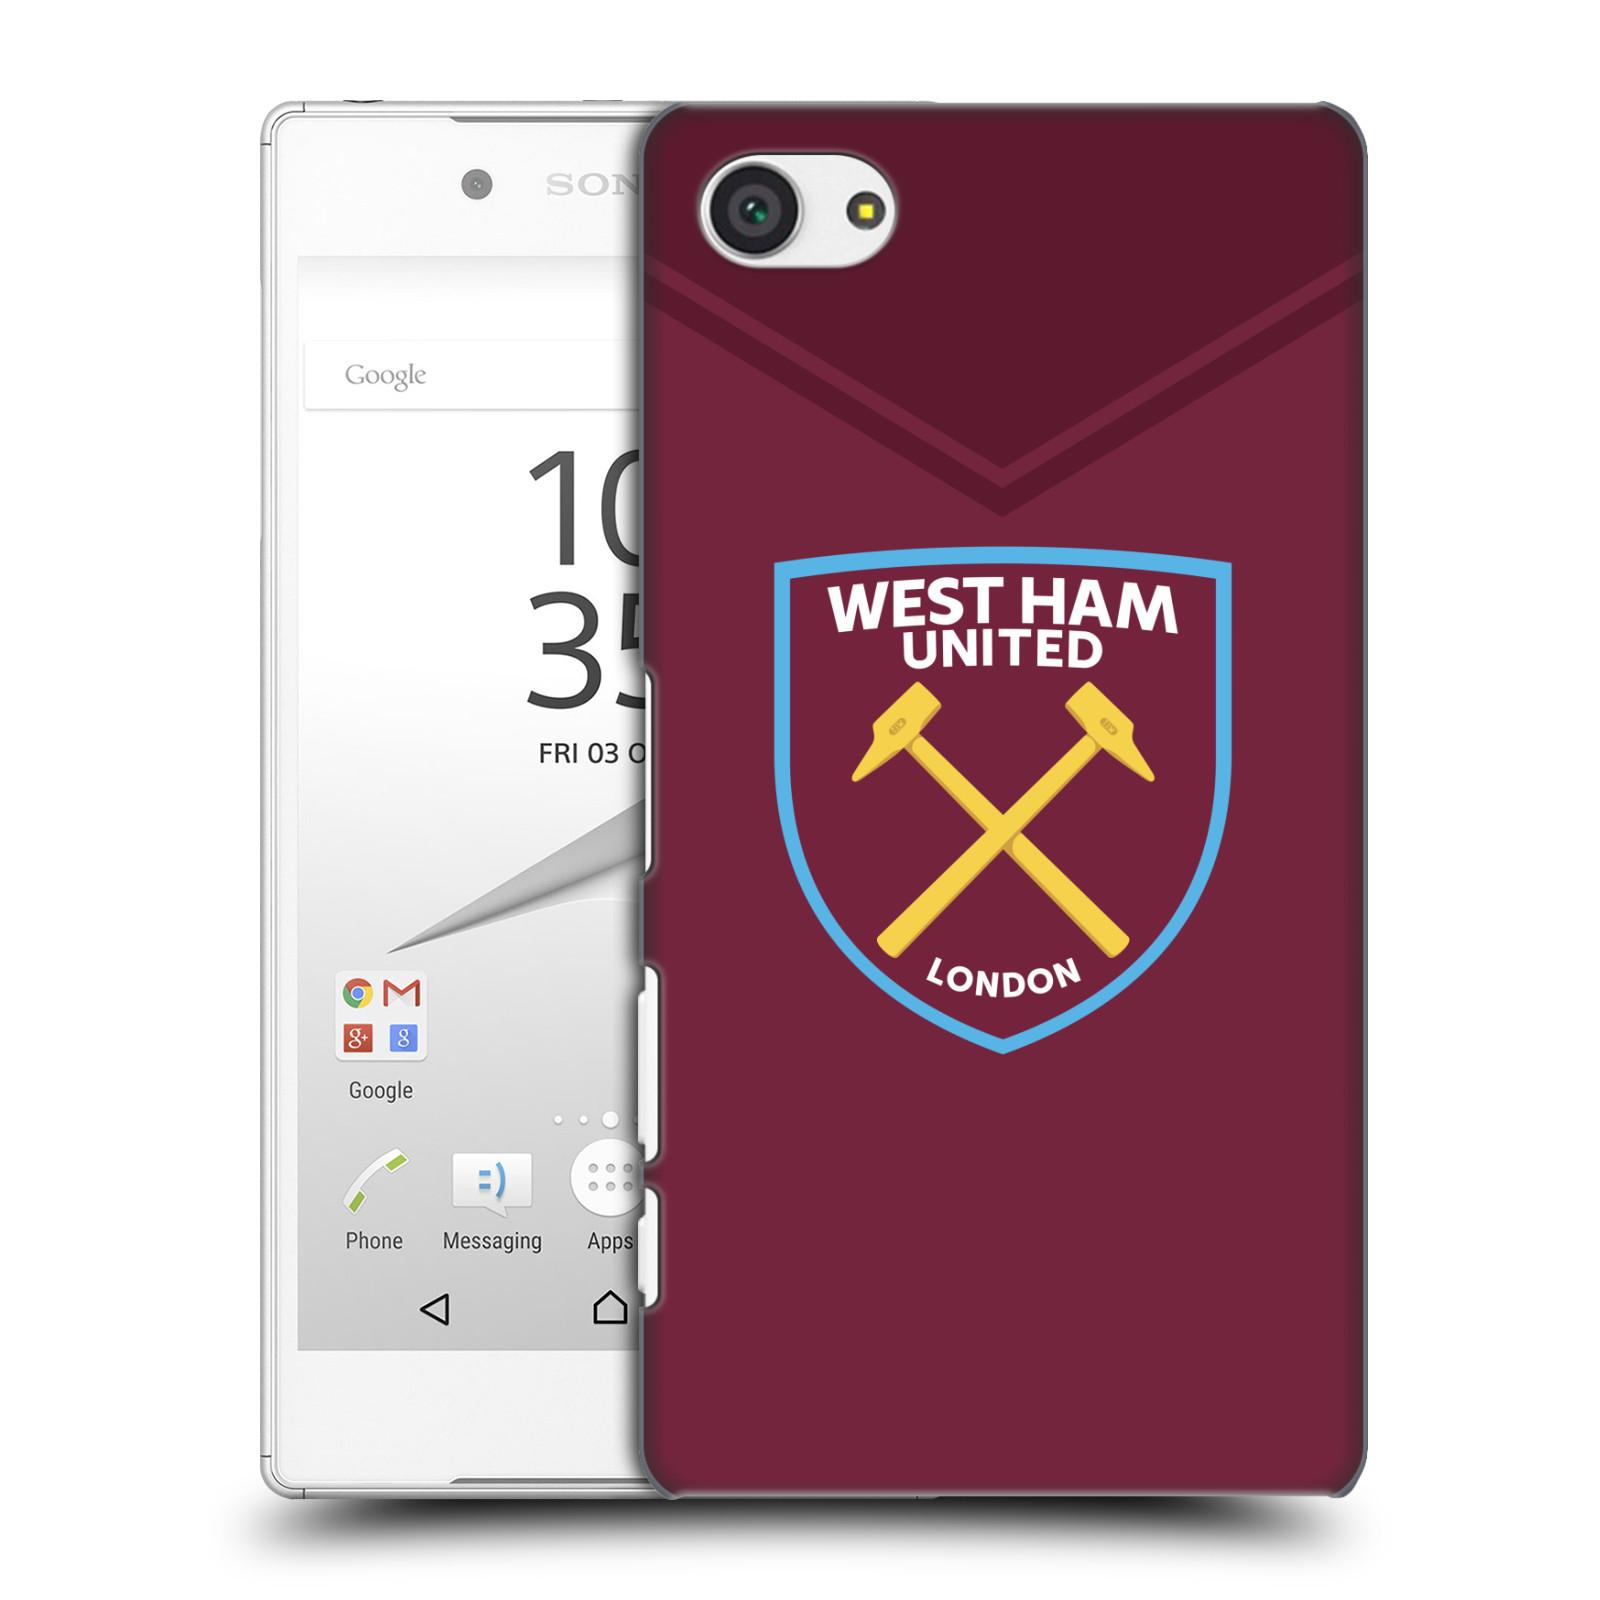 Plastové pouzdro na mobil Sony Xperia Z5 Compact - Head Case - West Ham United - Logo